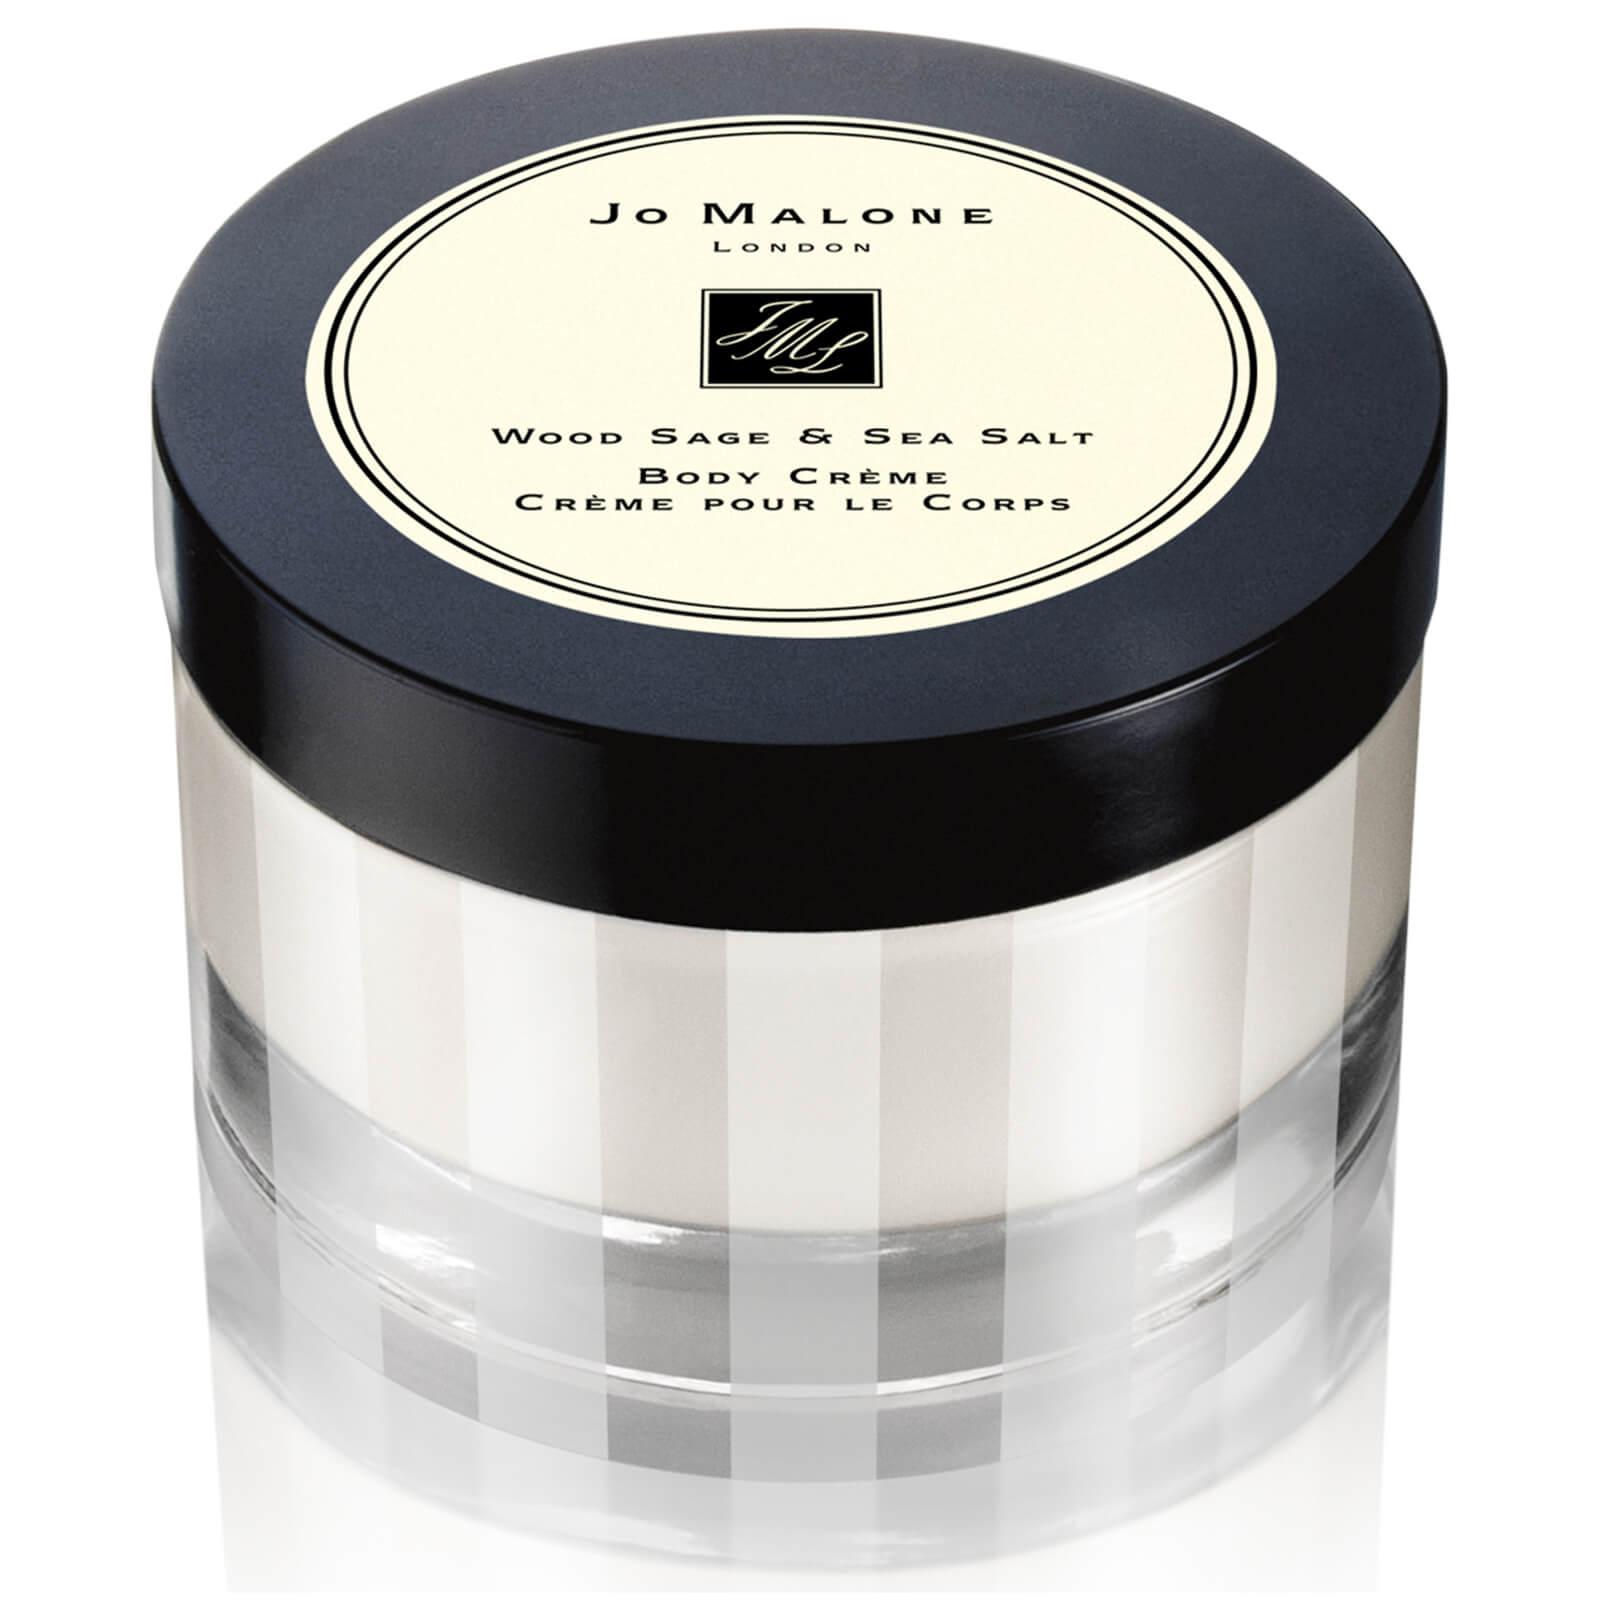 Jo Malone London Wood Sage and Sea Salt Body Crème (Various Sizes) - 50ML